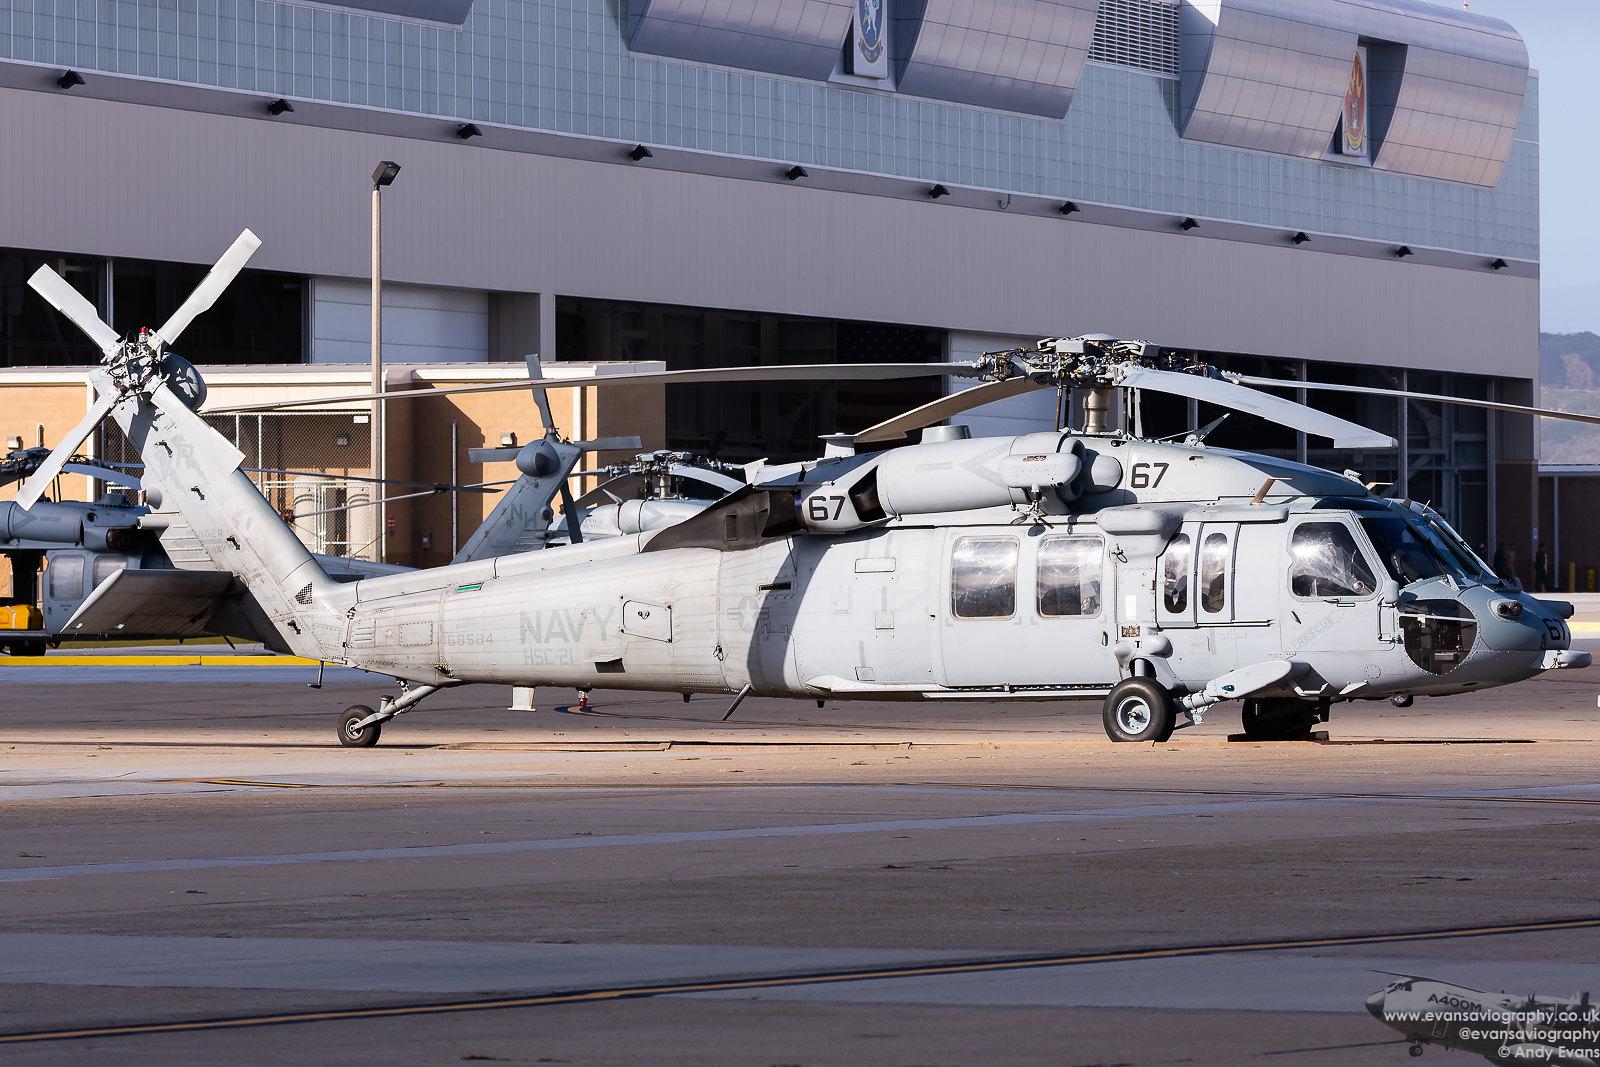 168584 MH-60S HSC-21